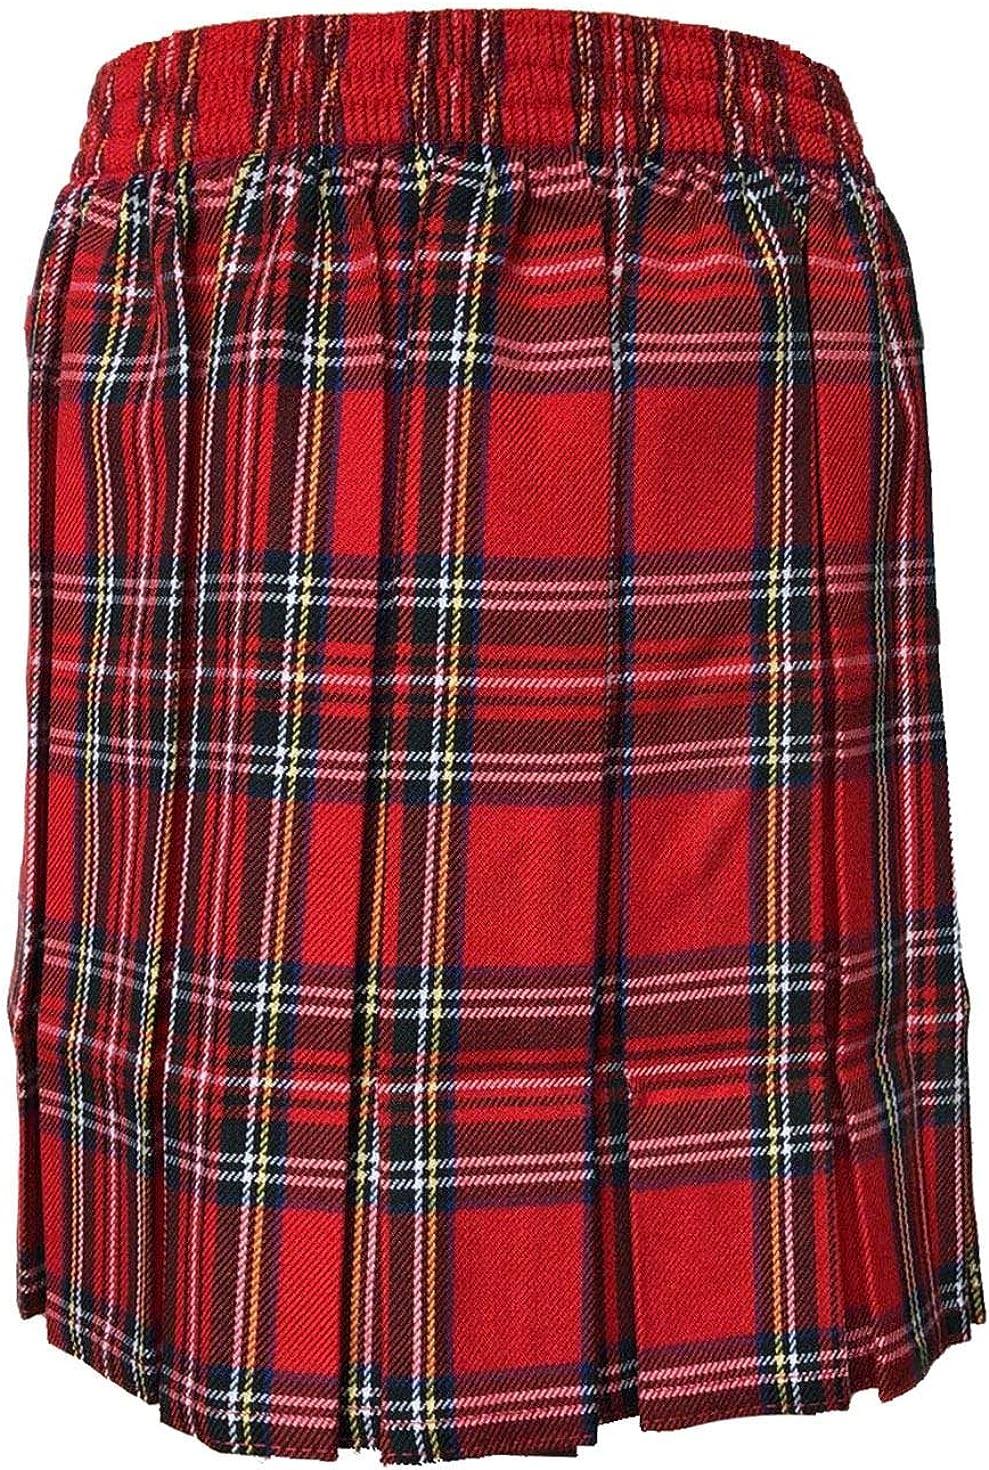 21FASHION Womens Box Plated Tartan Skirt Girls School Skirt